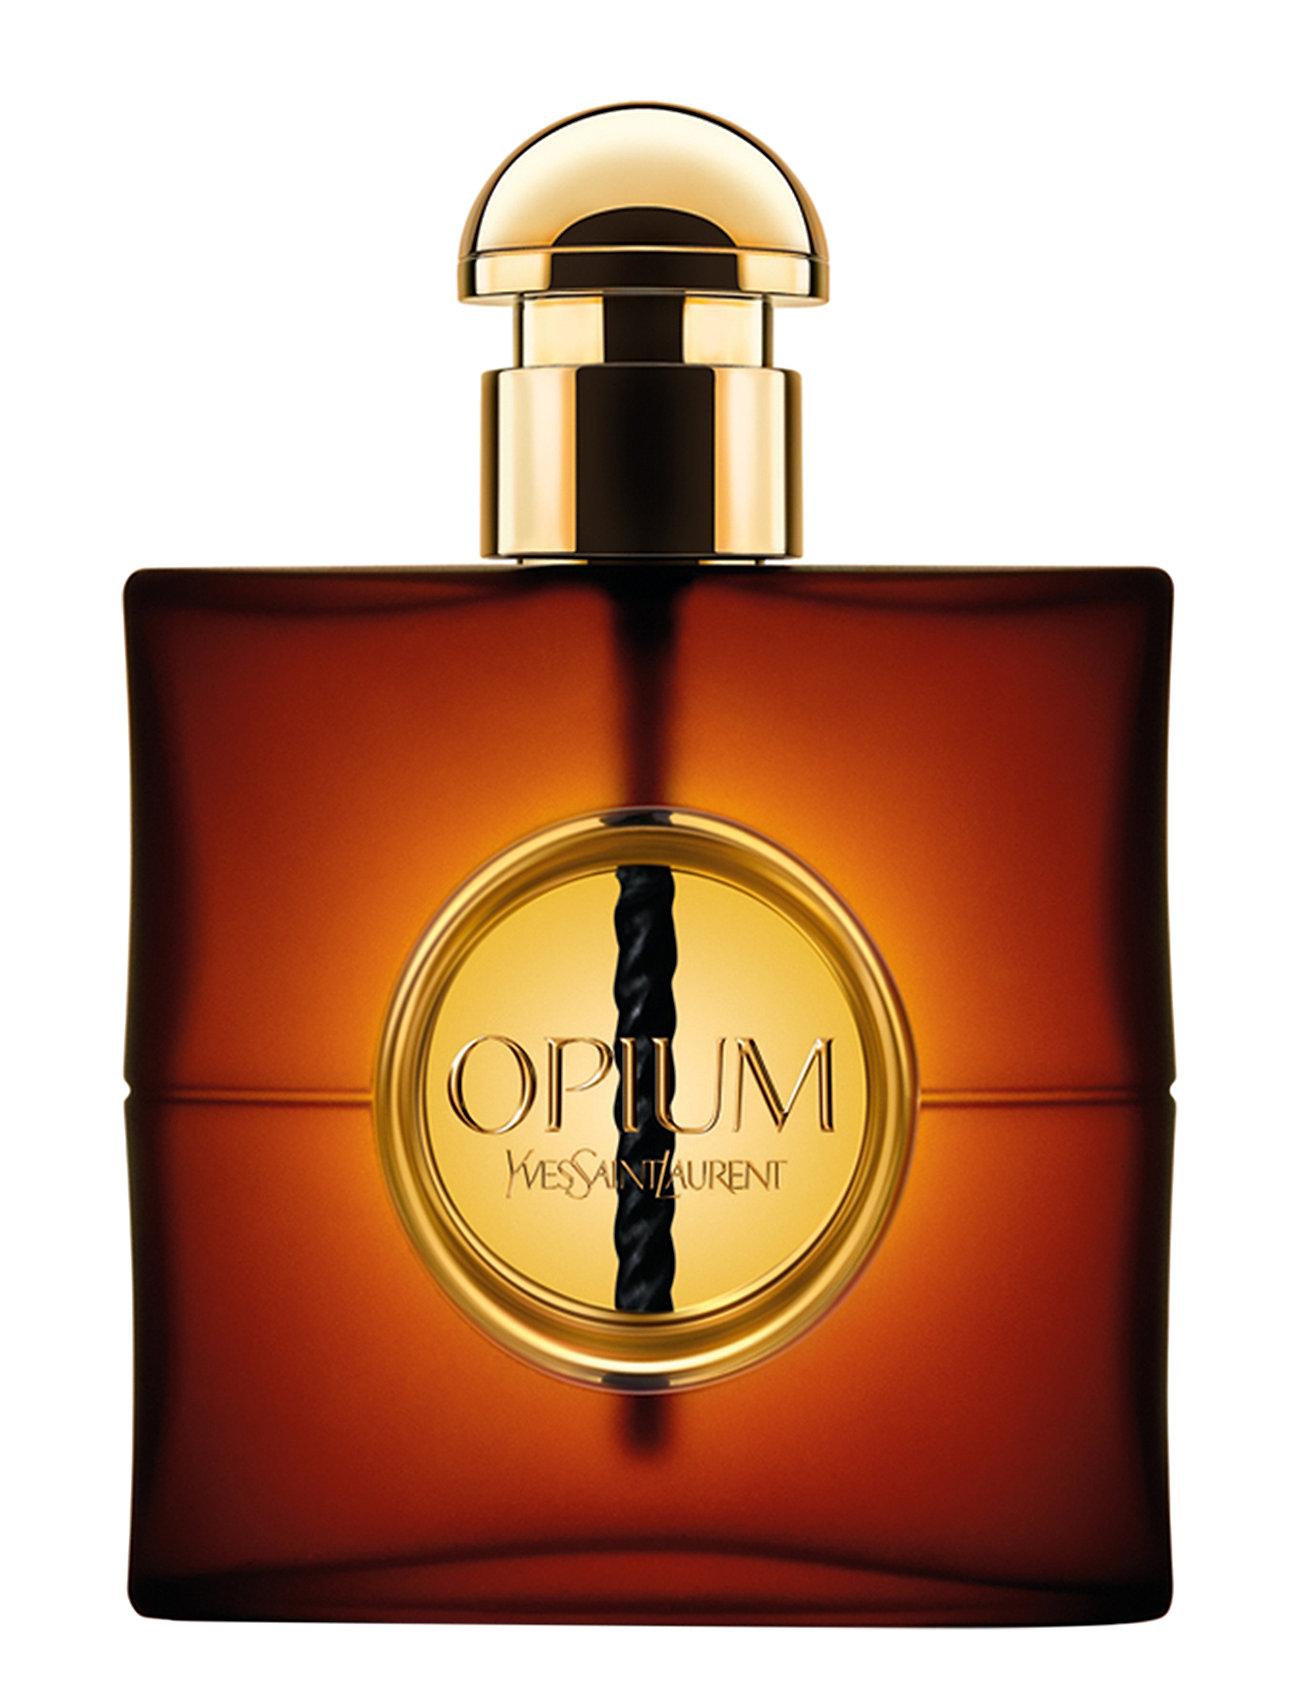 Opium eau de parfum 50 ml. fra yves saint laurent fra boozt.com dk